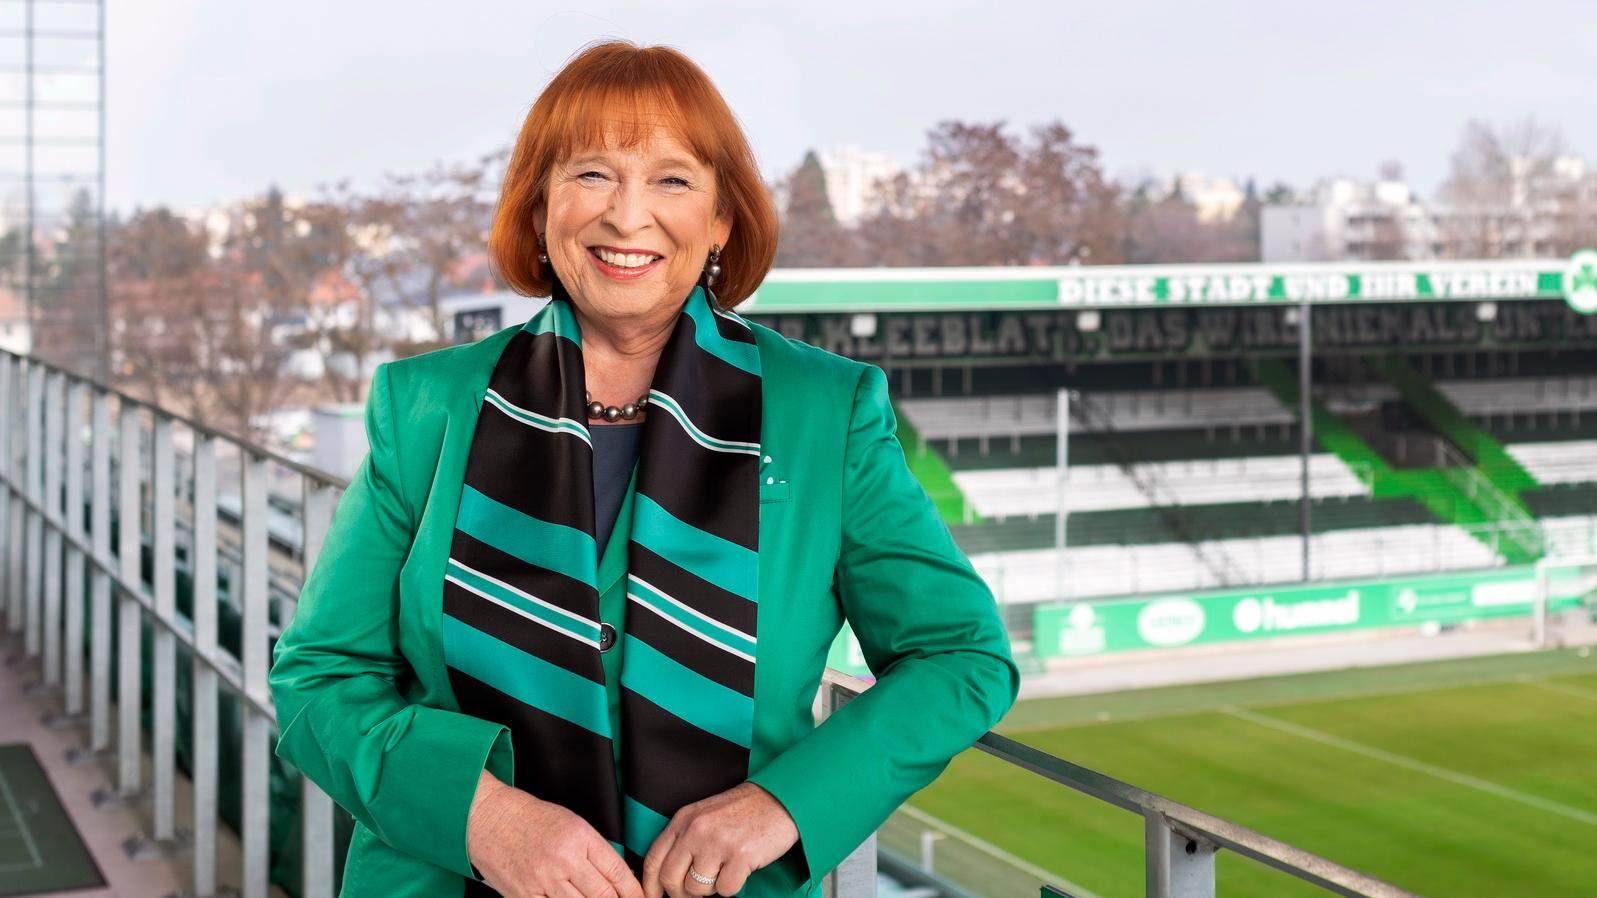 Ingrid Hofmann in Vereinsfarben im Stadion